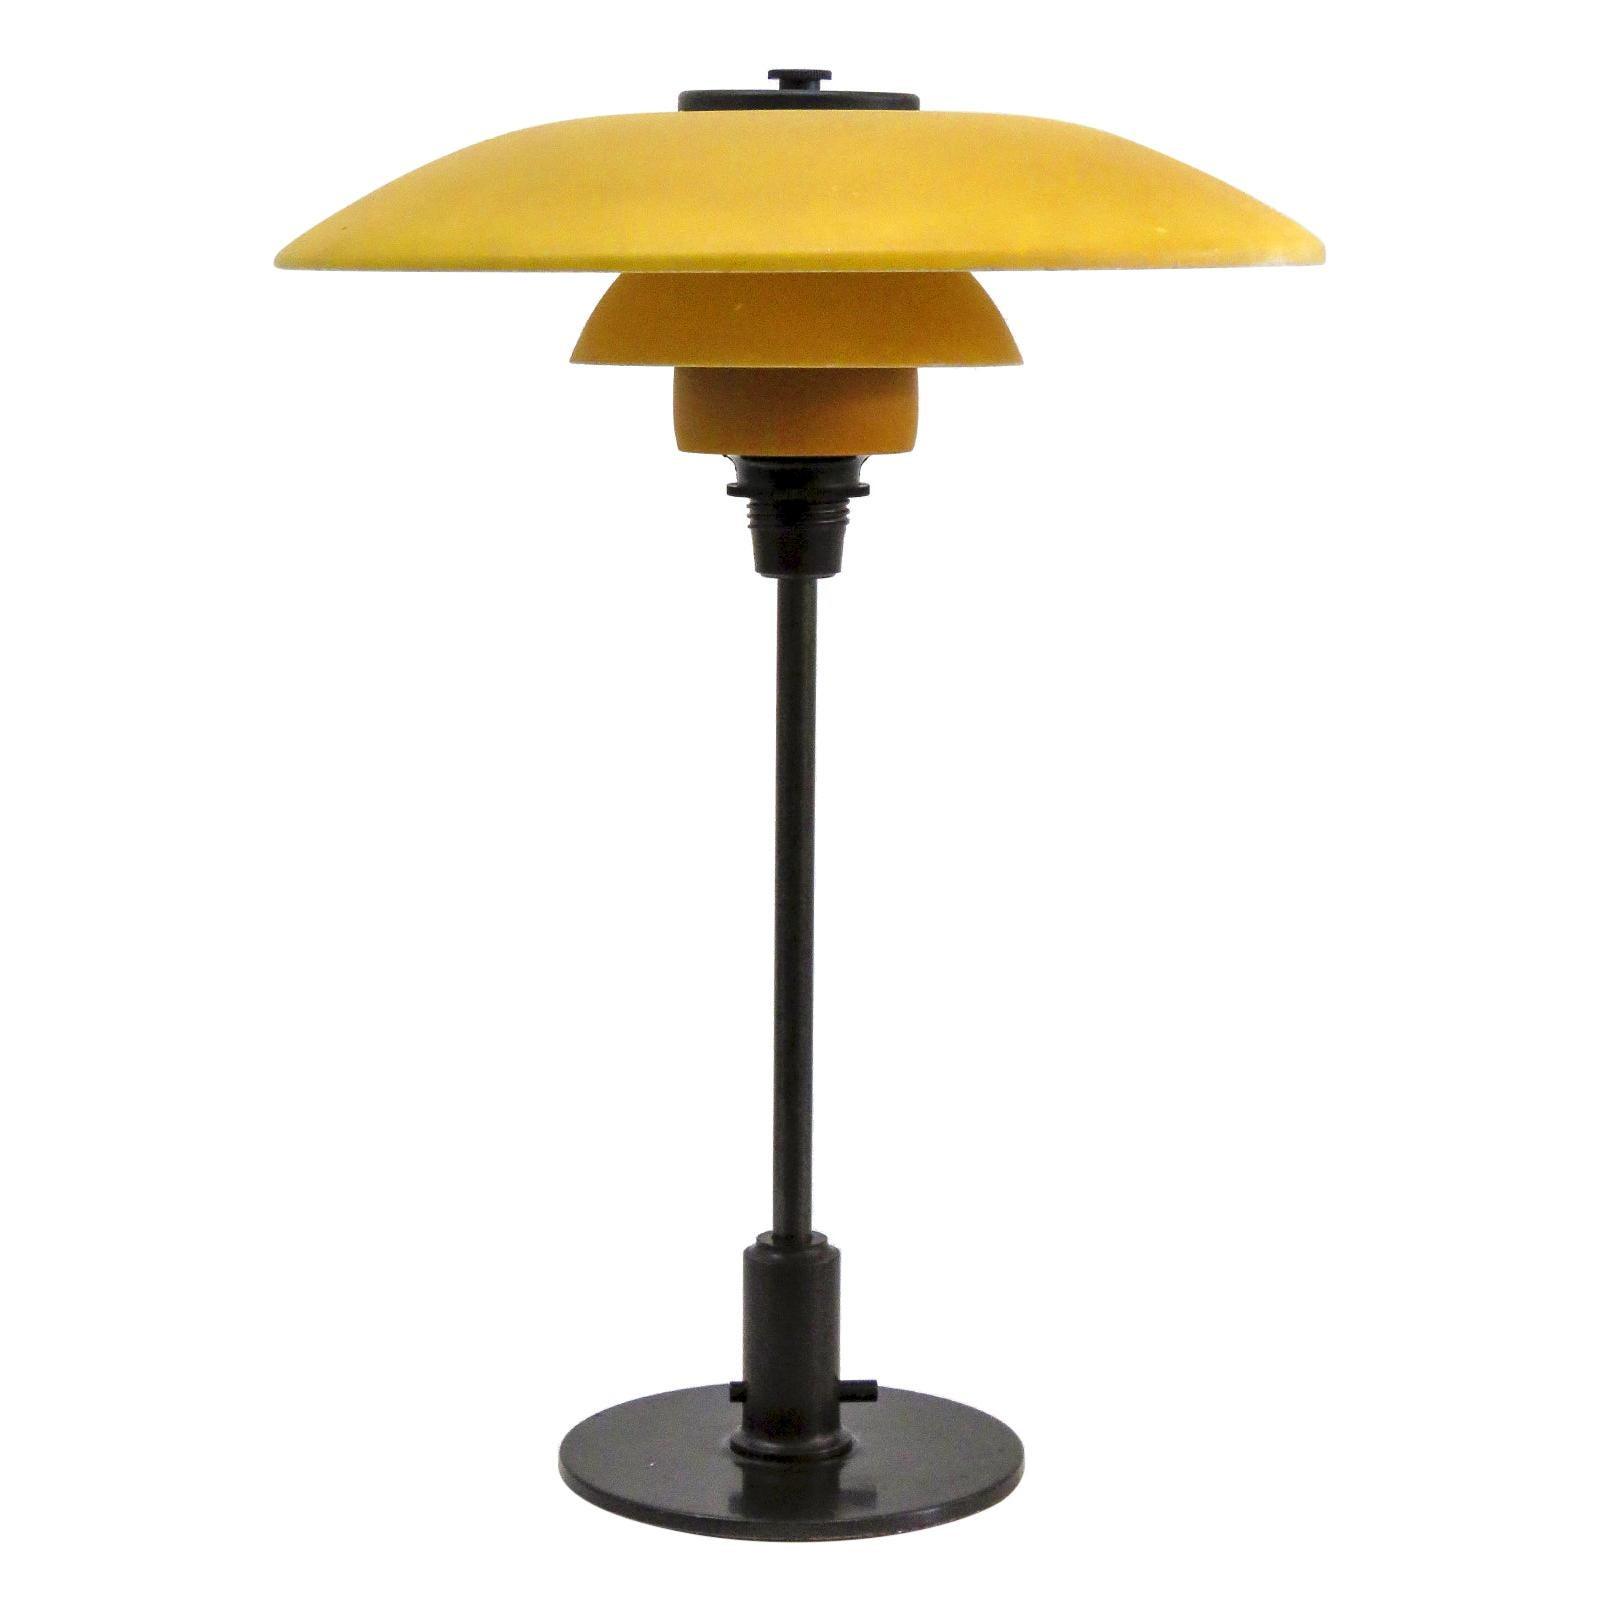 Rare Poul Henningsen PH 3½-2 Table Lamp, 1930